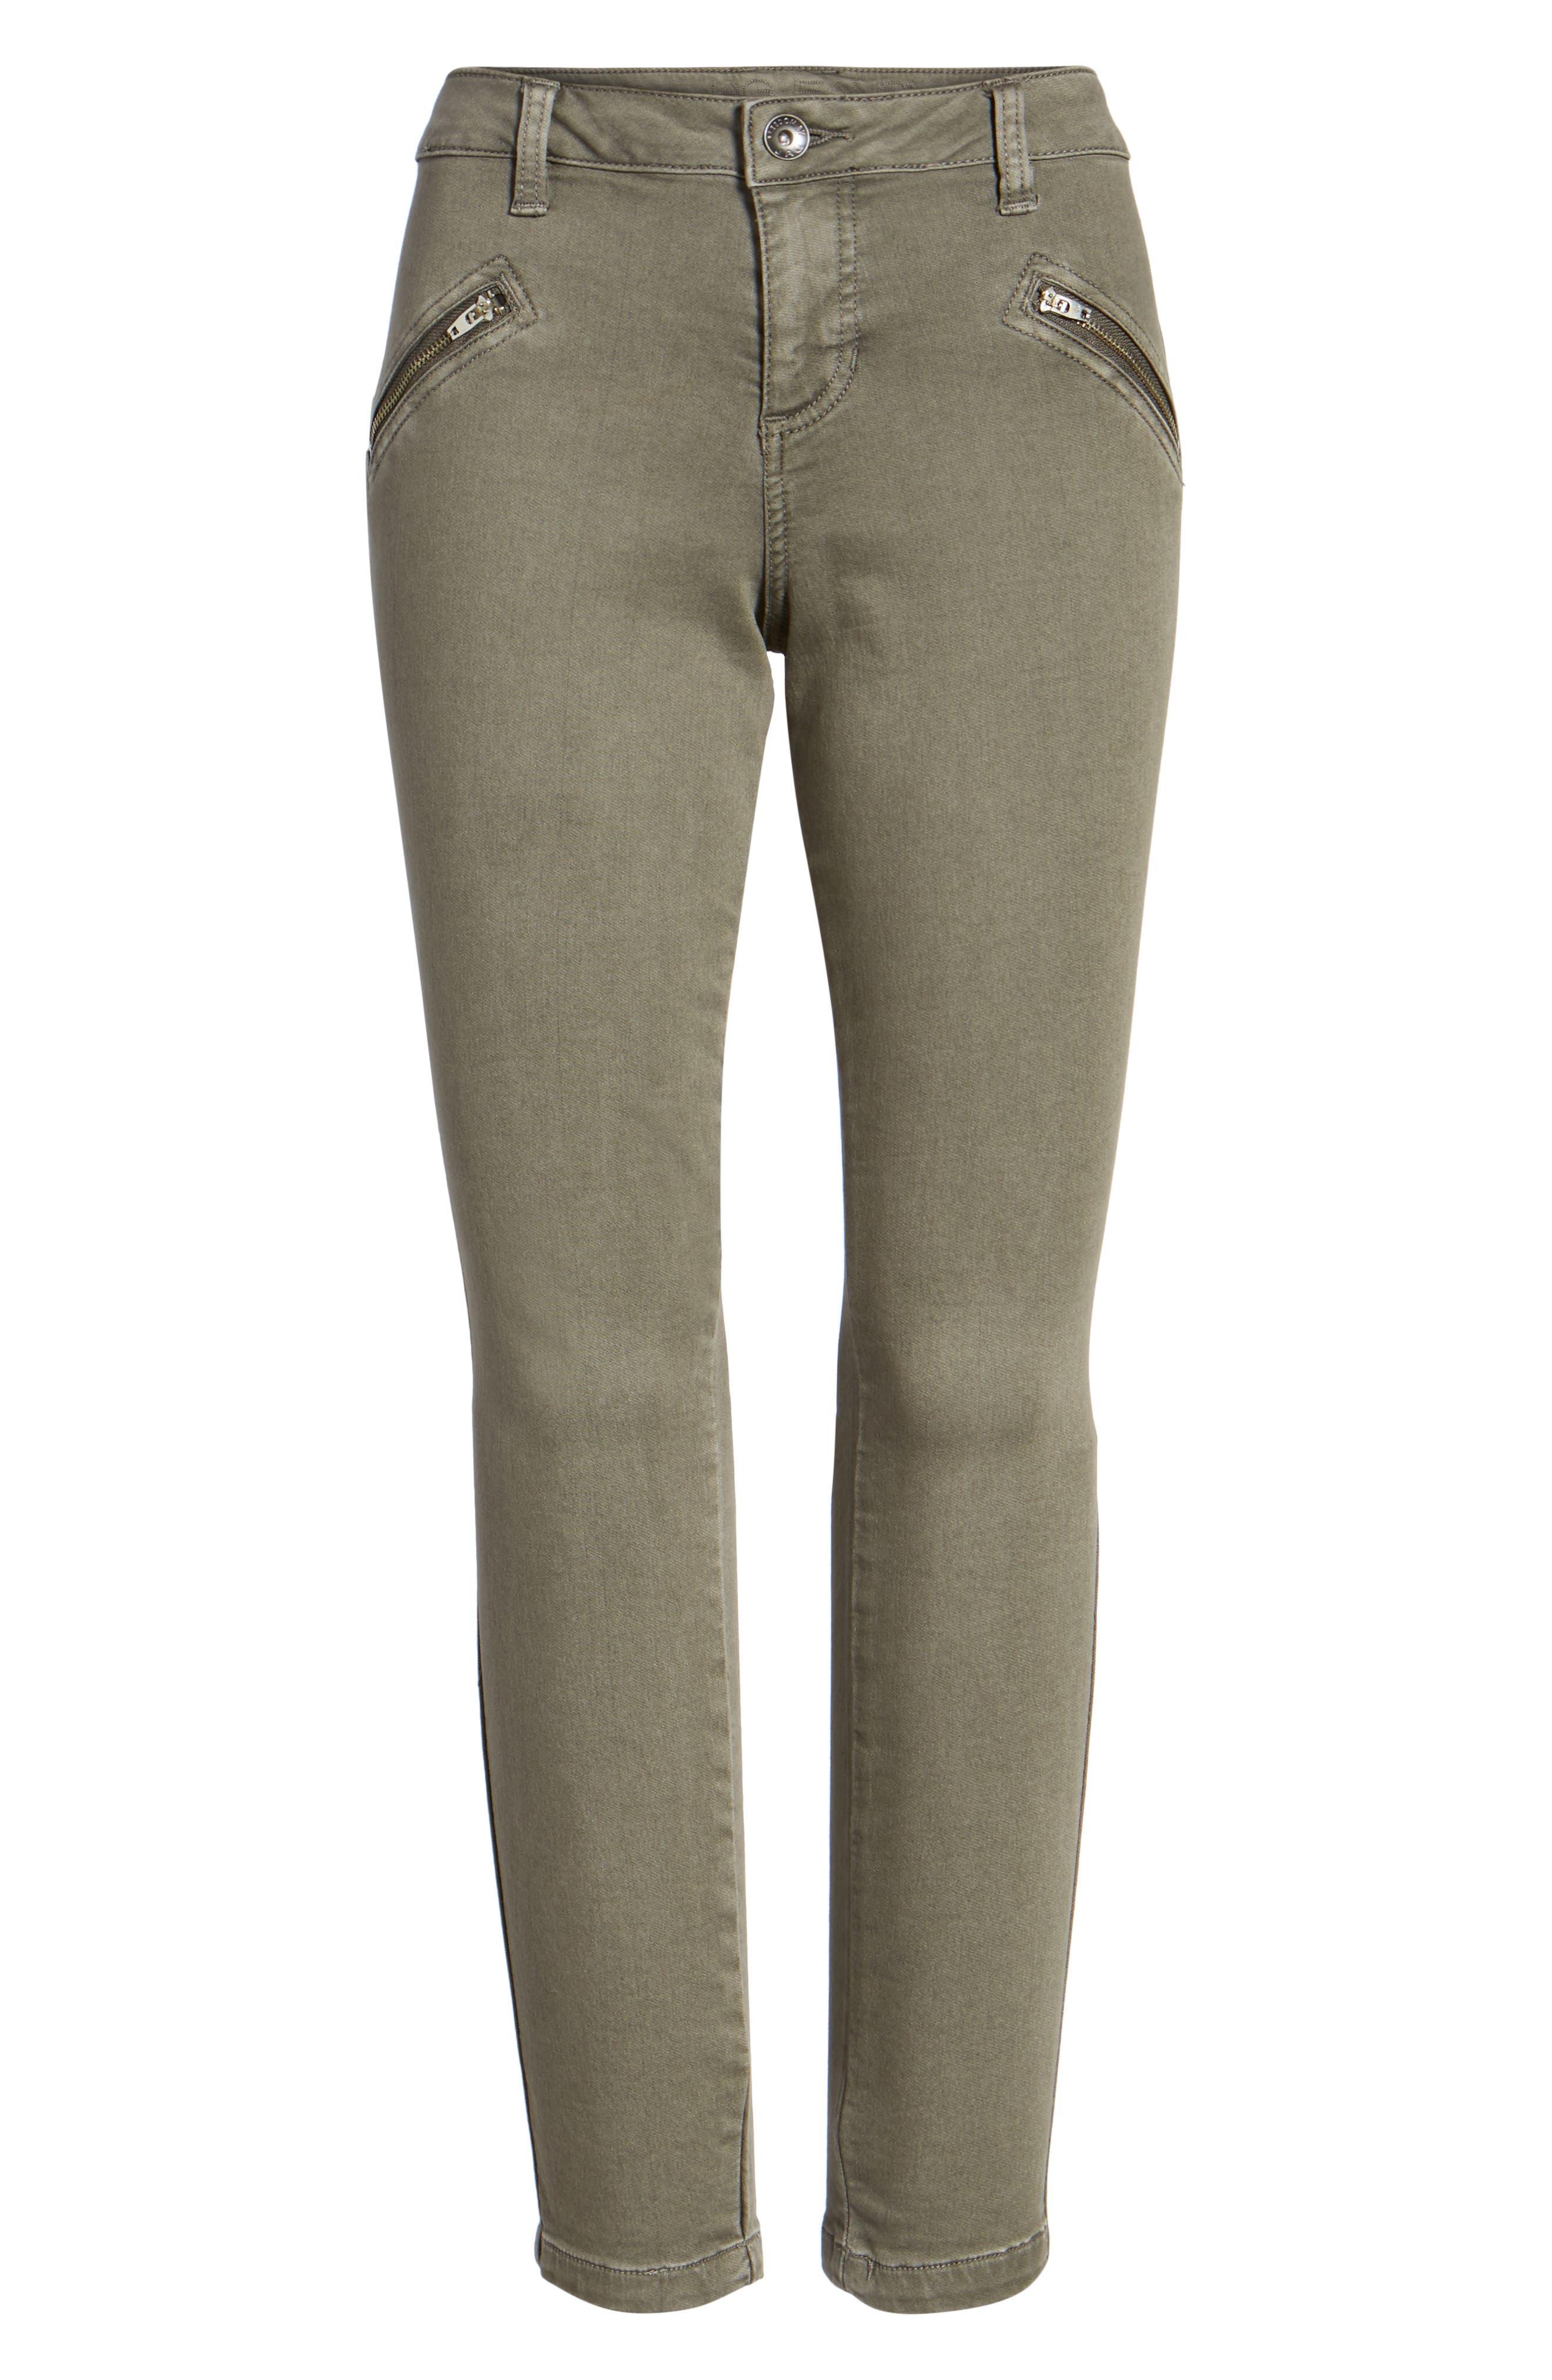 Ryan Knit Skinny Jeans,                             Alternate thumbnail 6, color,                             205